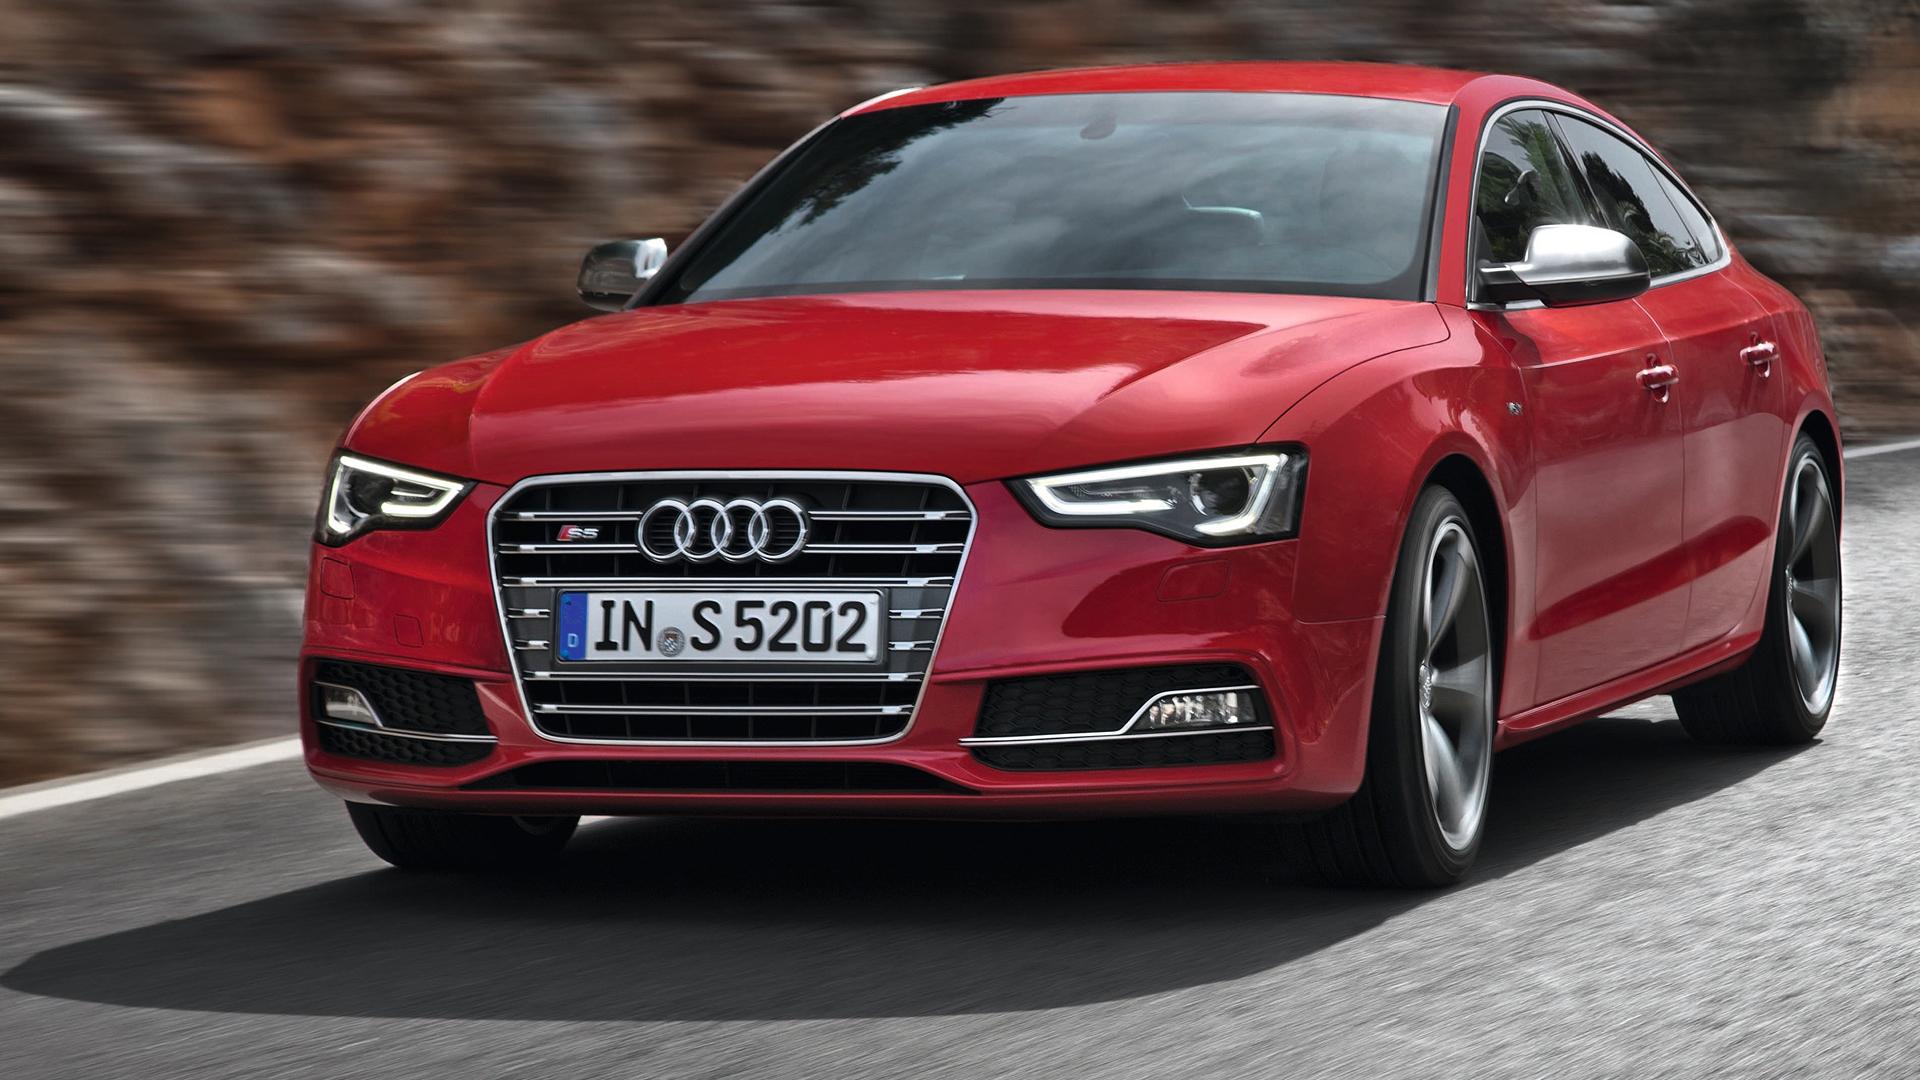 Audi S5 2015 STD